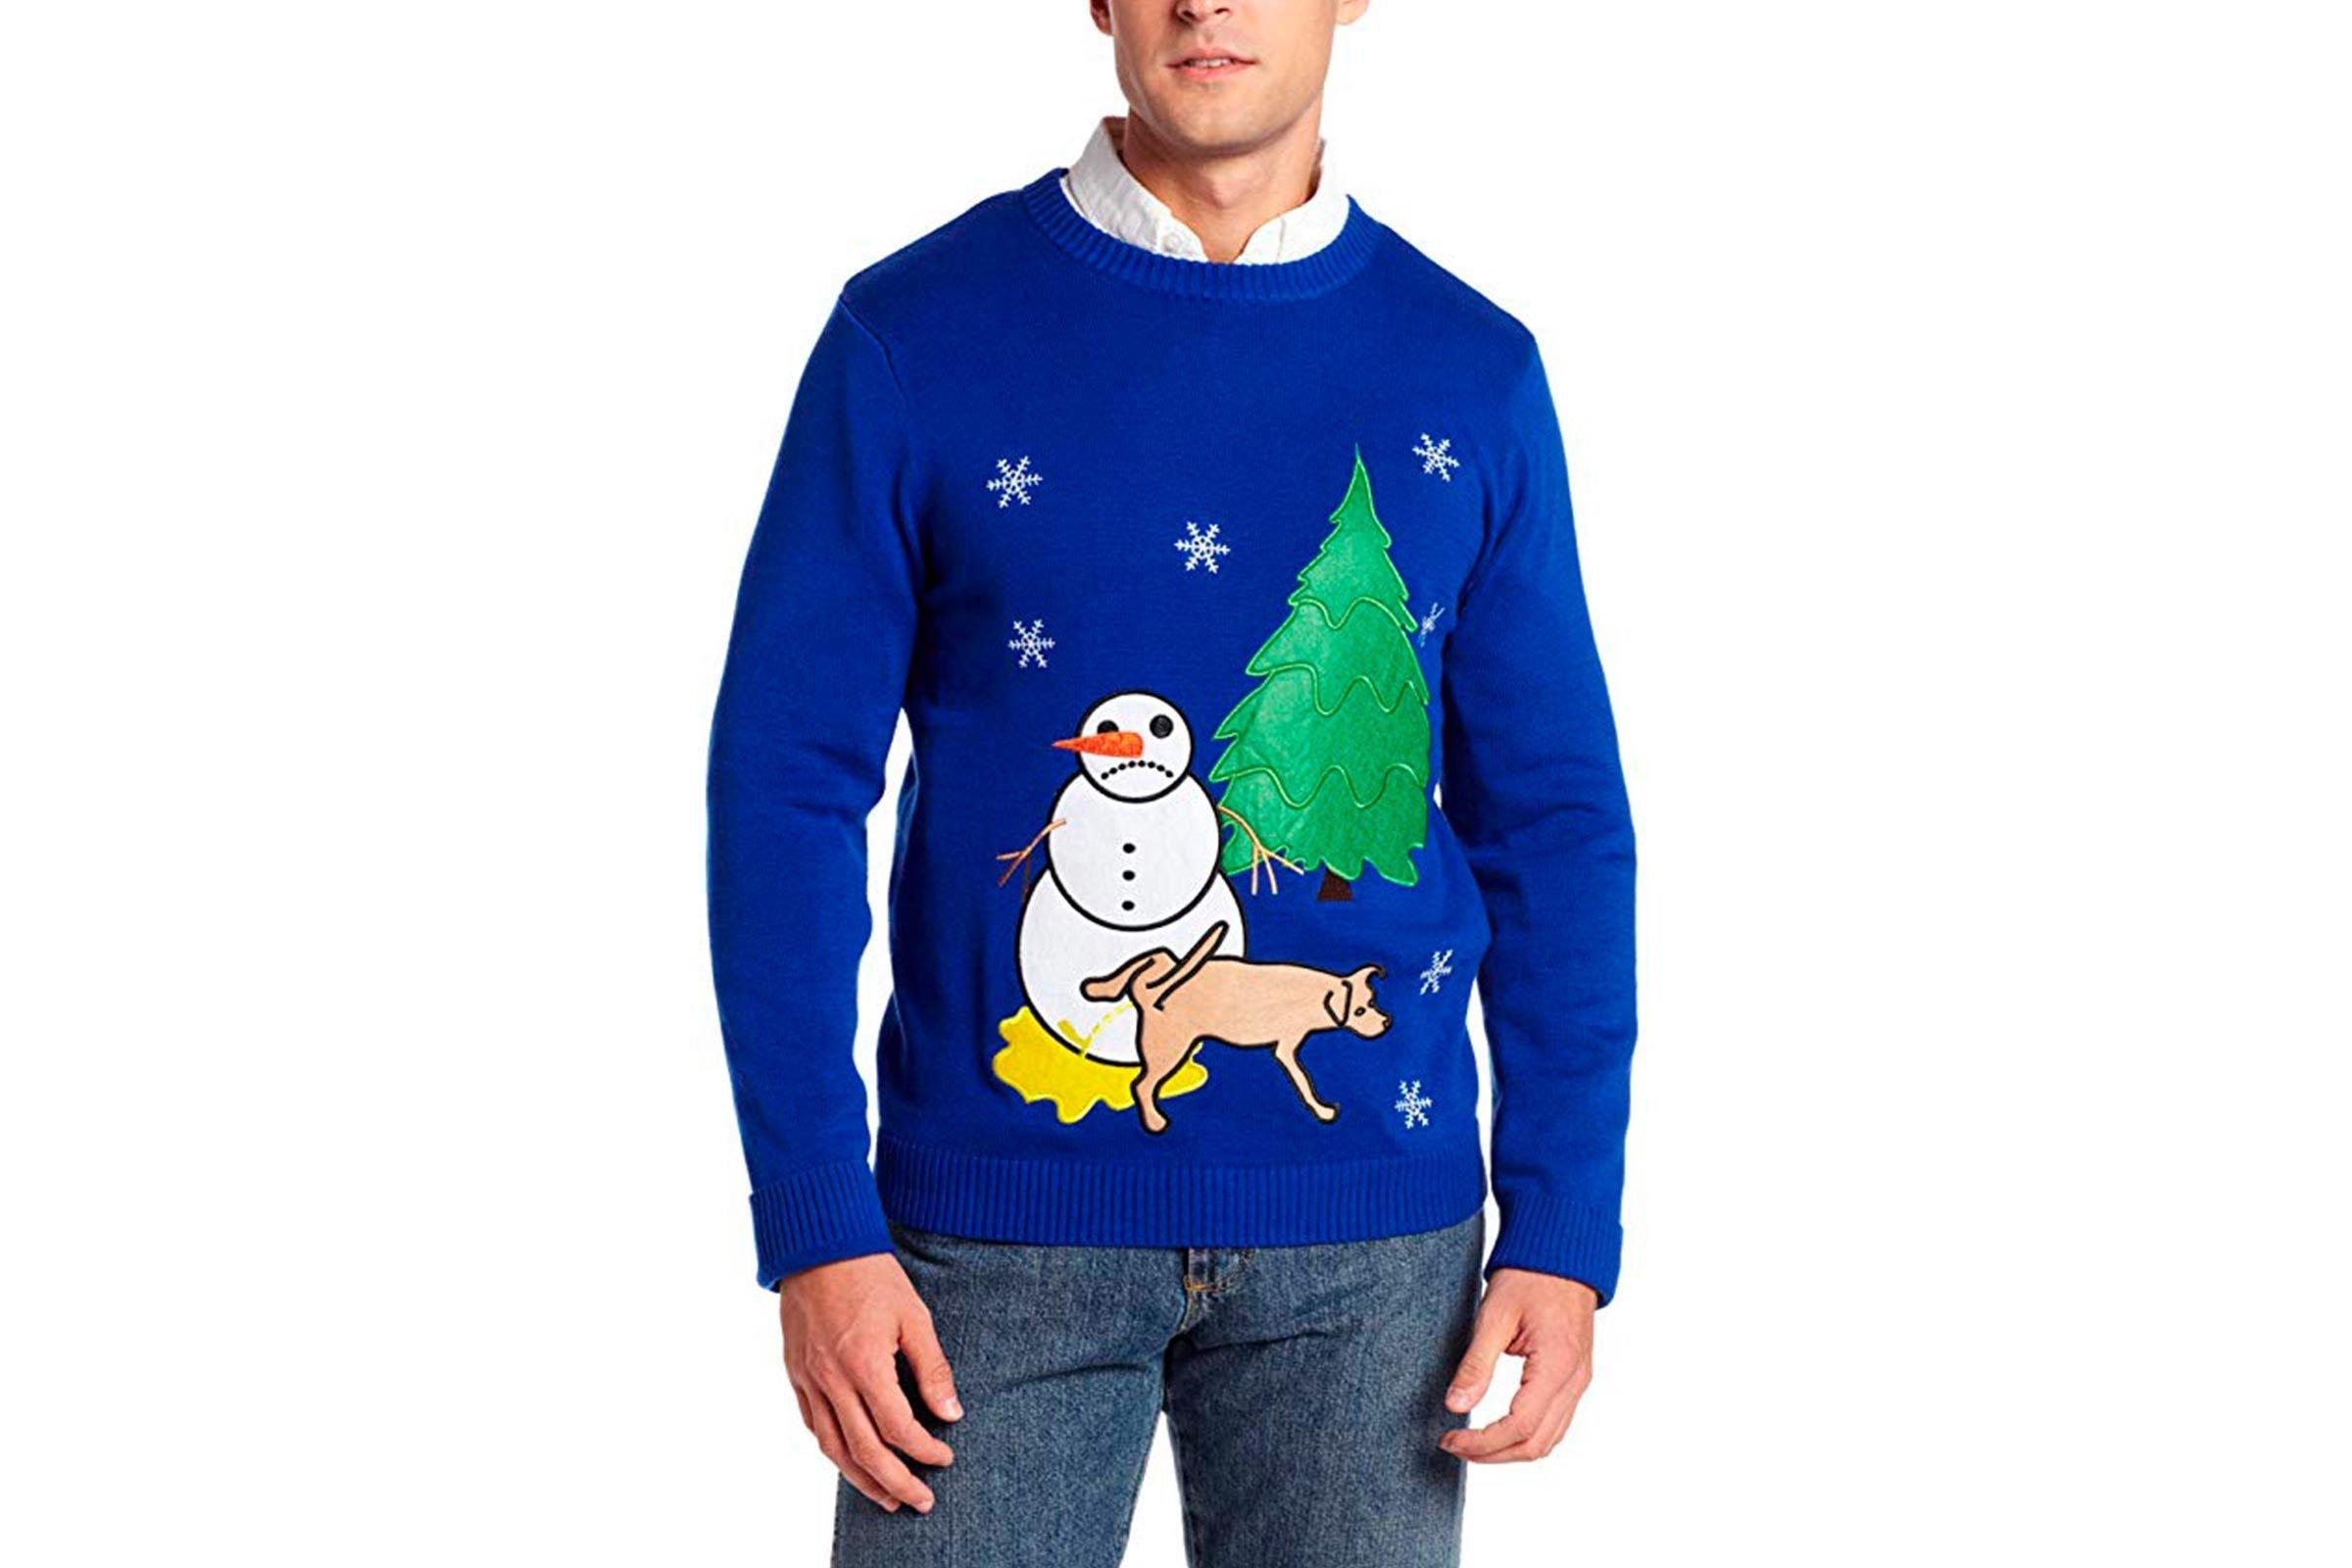 Dog peeing on snowman Christmas sweater